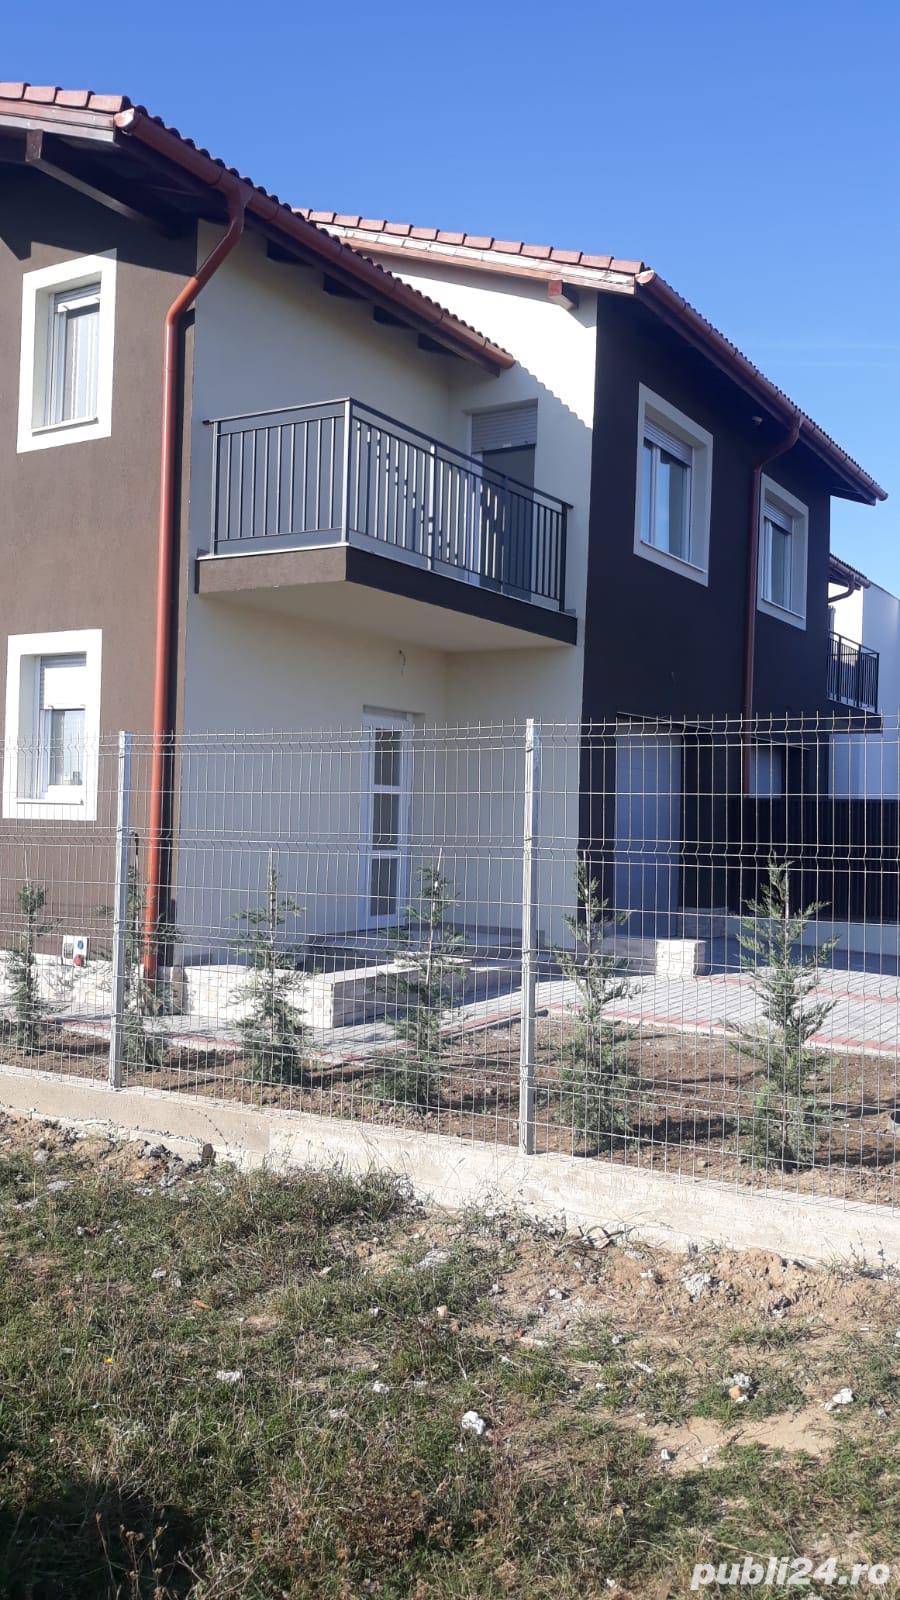 Casa noua tip Duplex  cu garaj la doi pasi de Timisoara in loc Chisoda